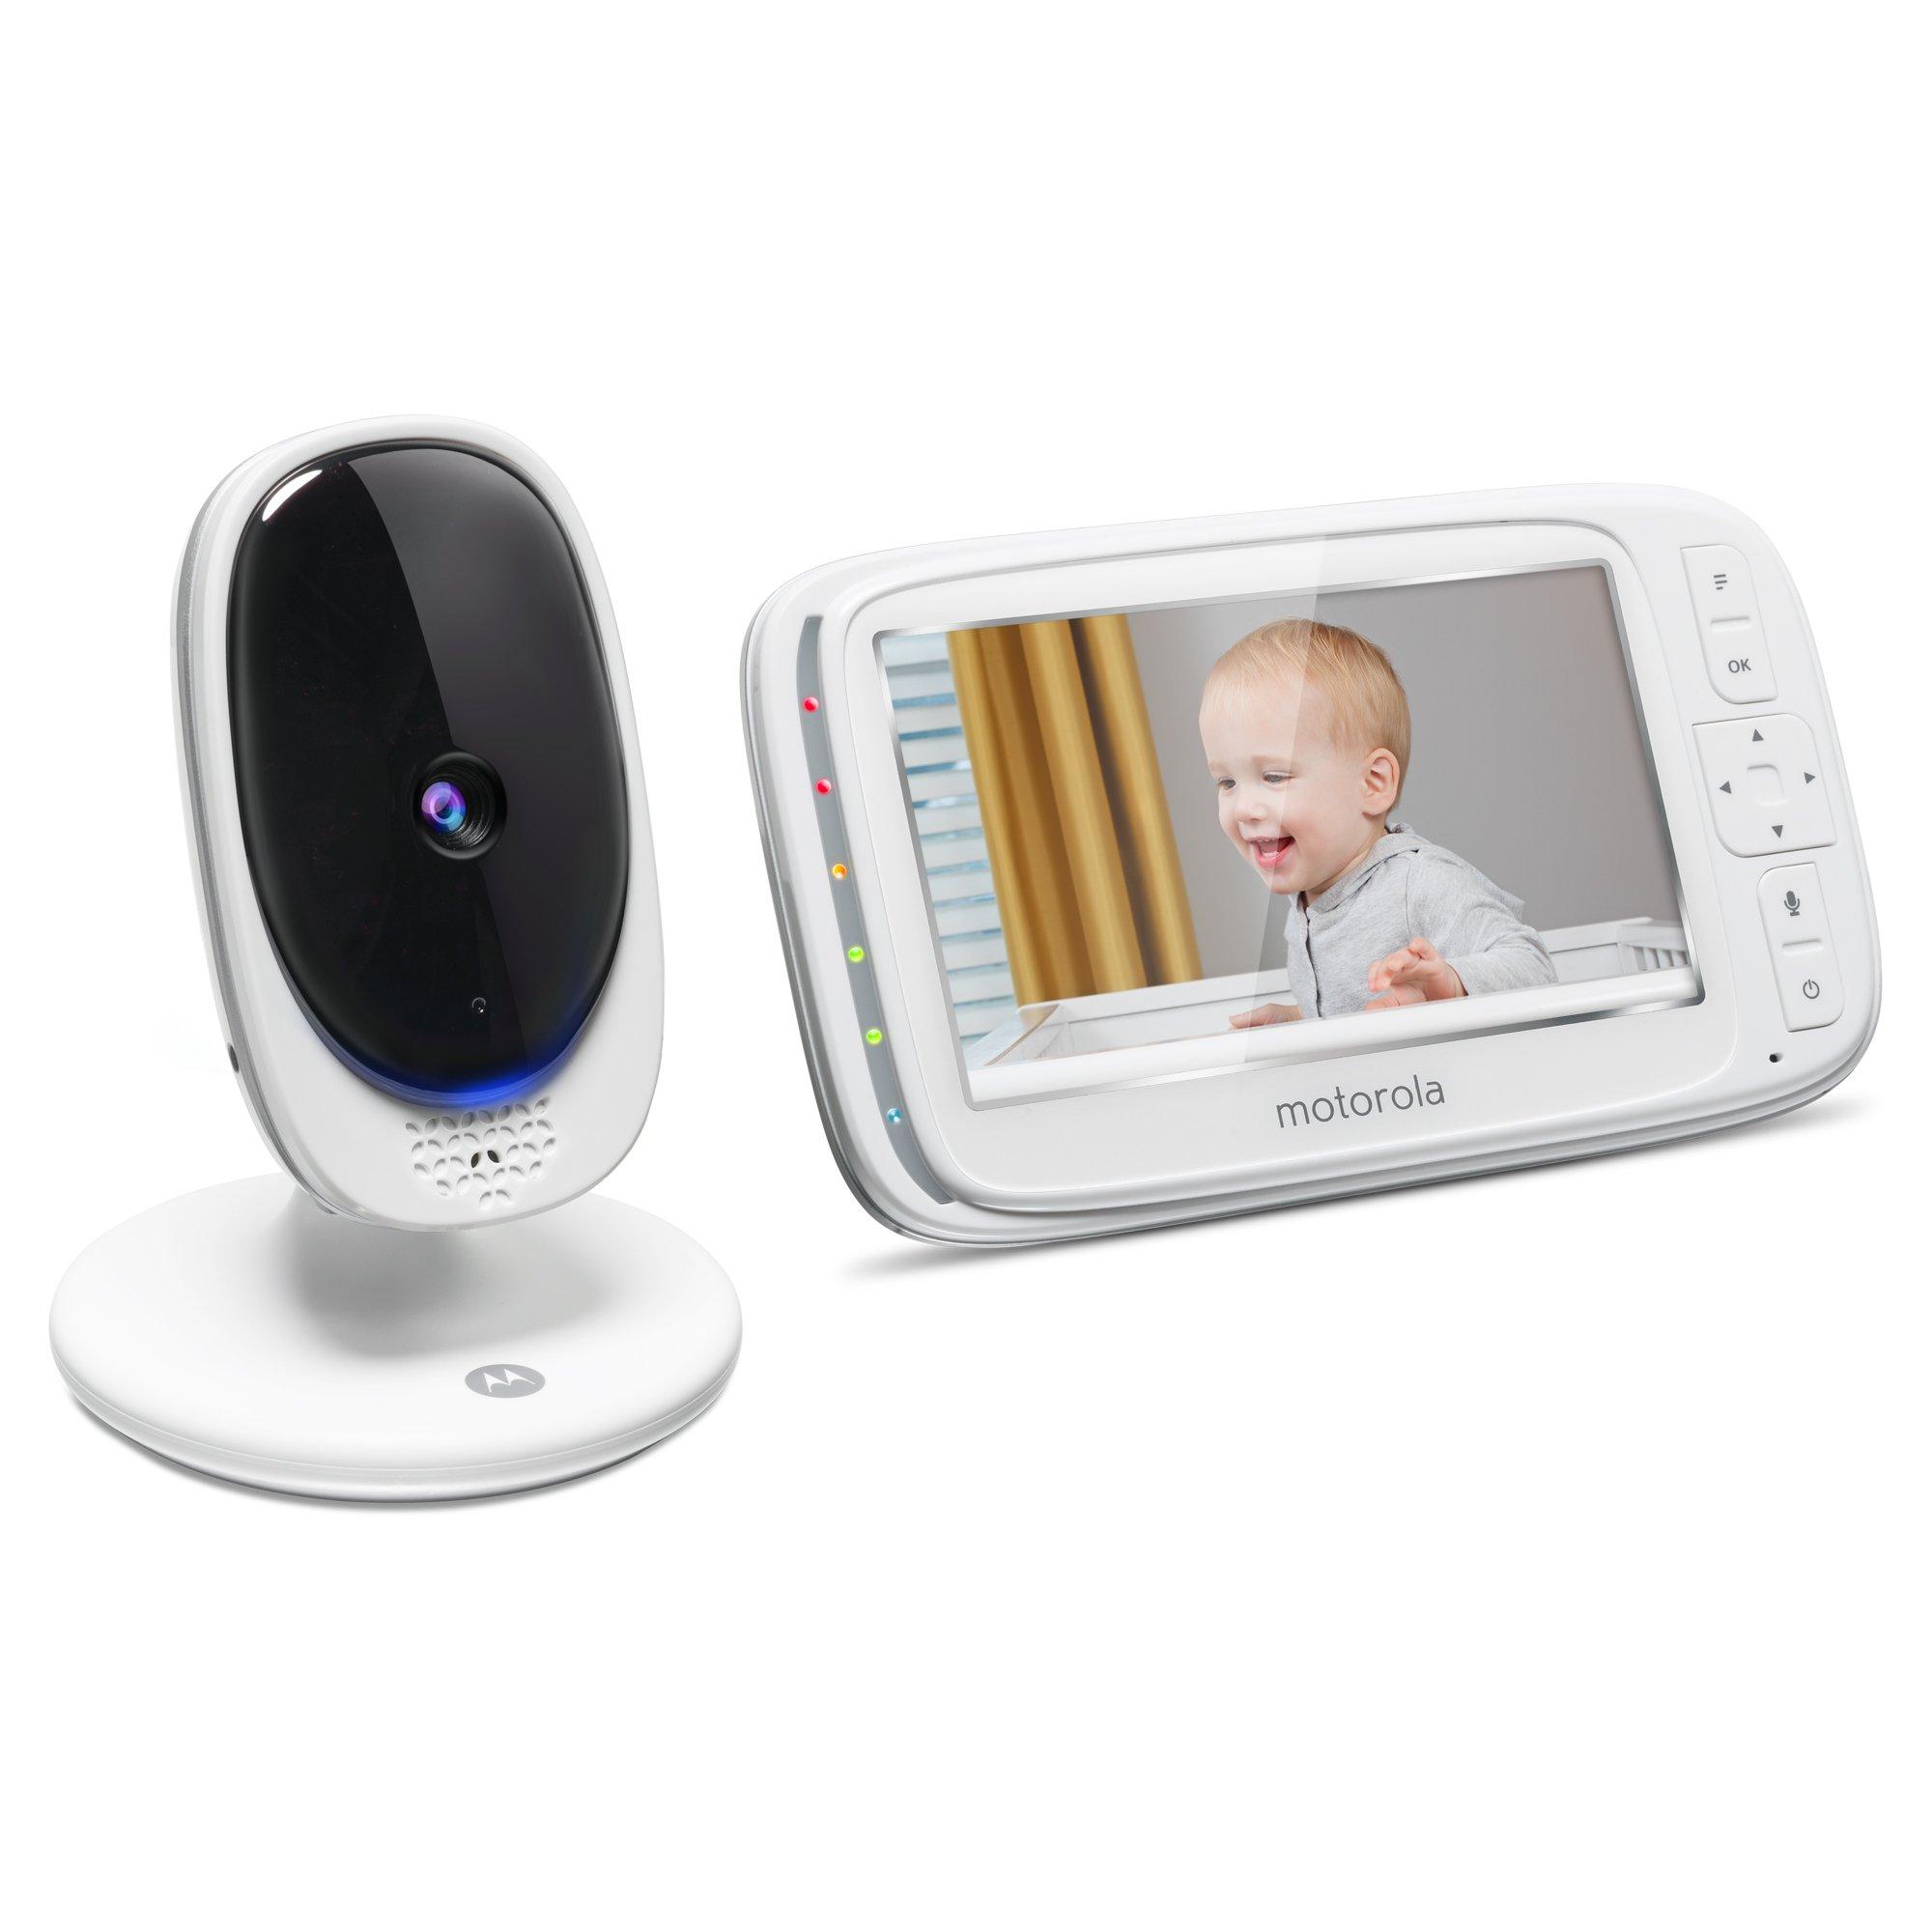 Motorola Comfort 50 Digital Video Audio Baby Monitor with 5 inch Color Screen by Motorola Baby (Image #3)